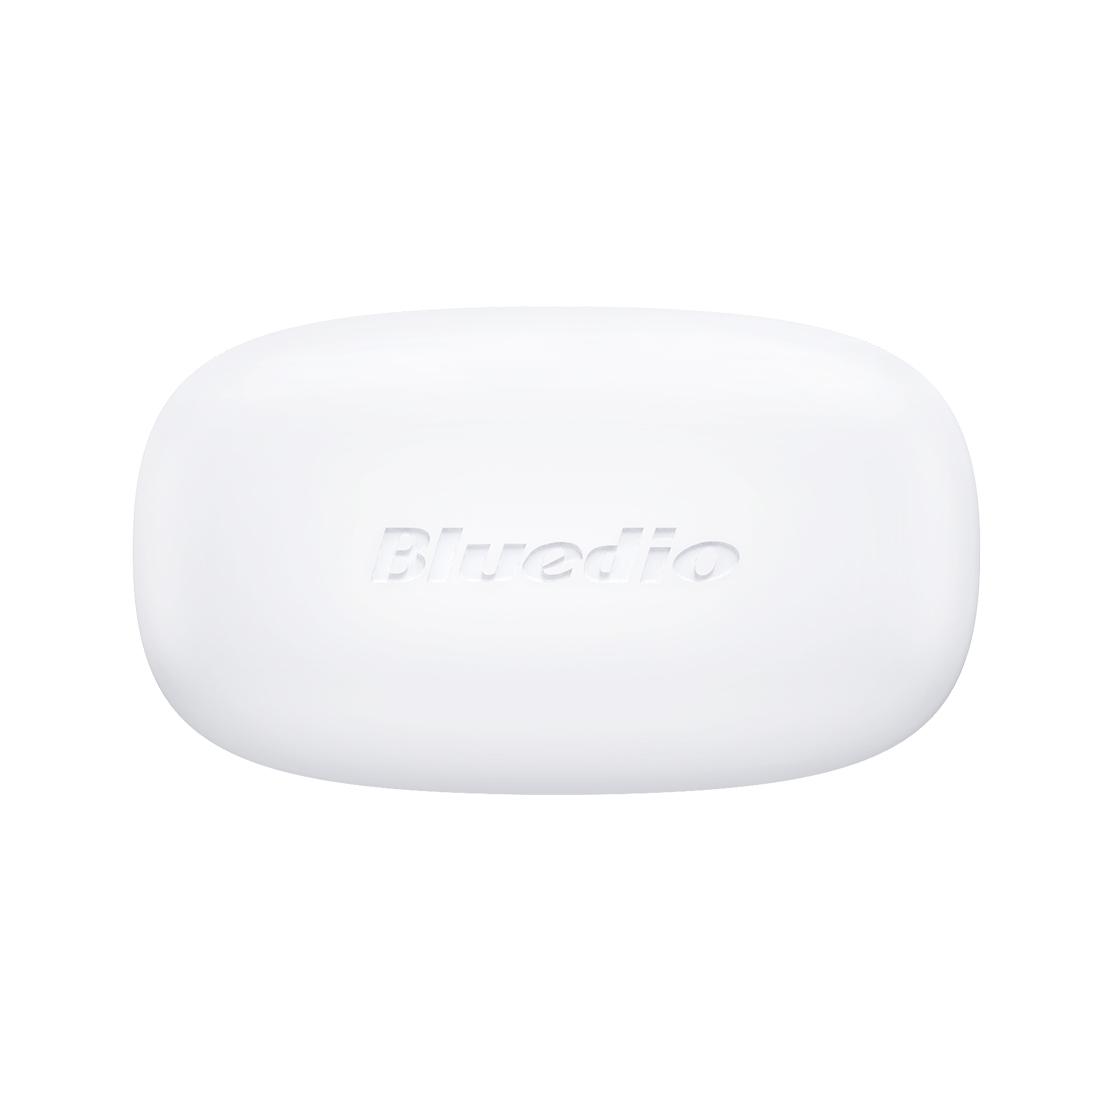 Bluedio Ei Bluetooth True Wireless Stereo Earbuds Headphones with Wireless Charging